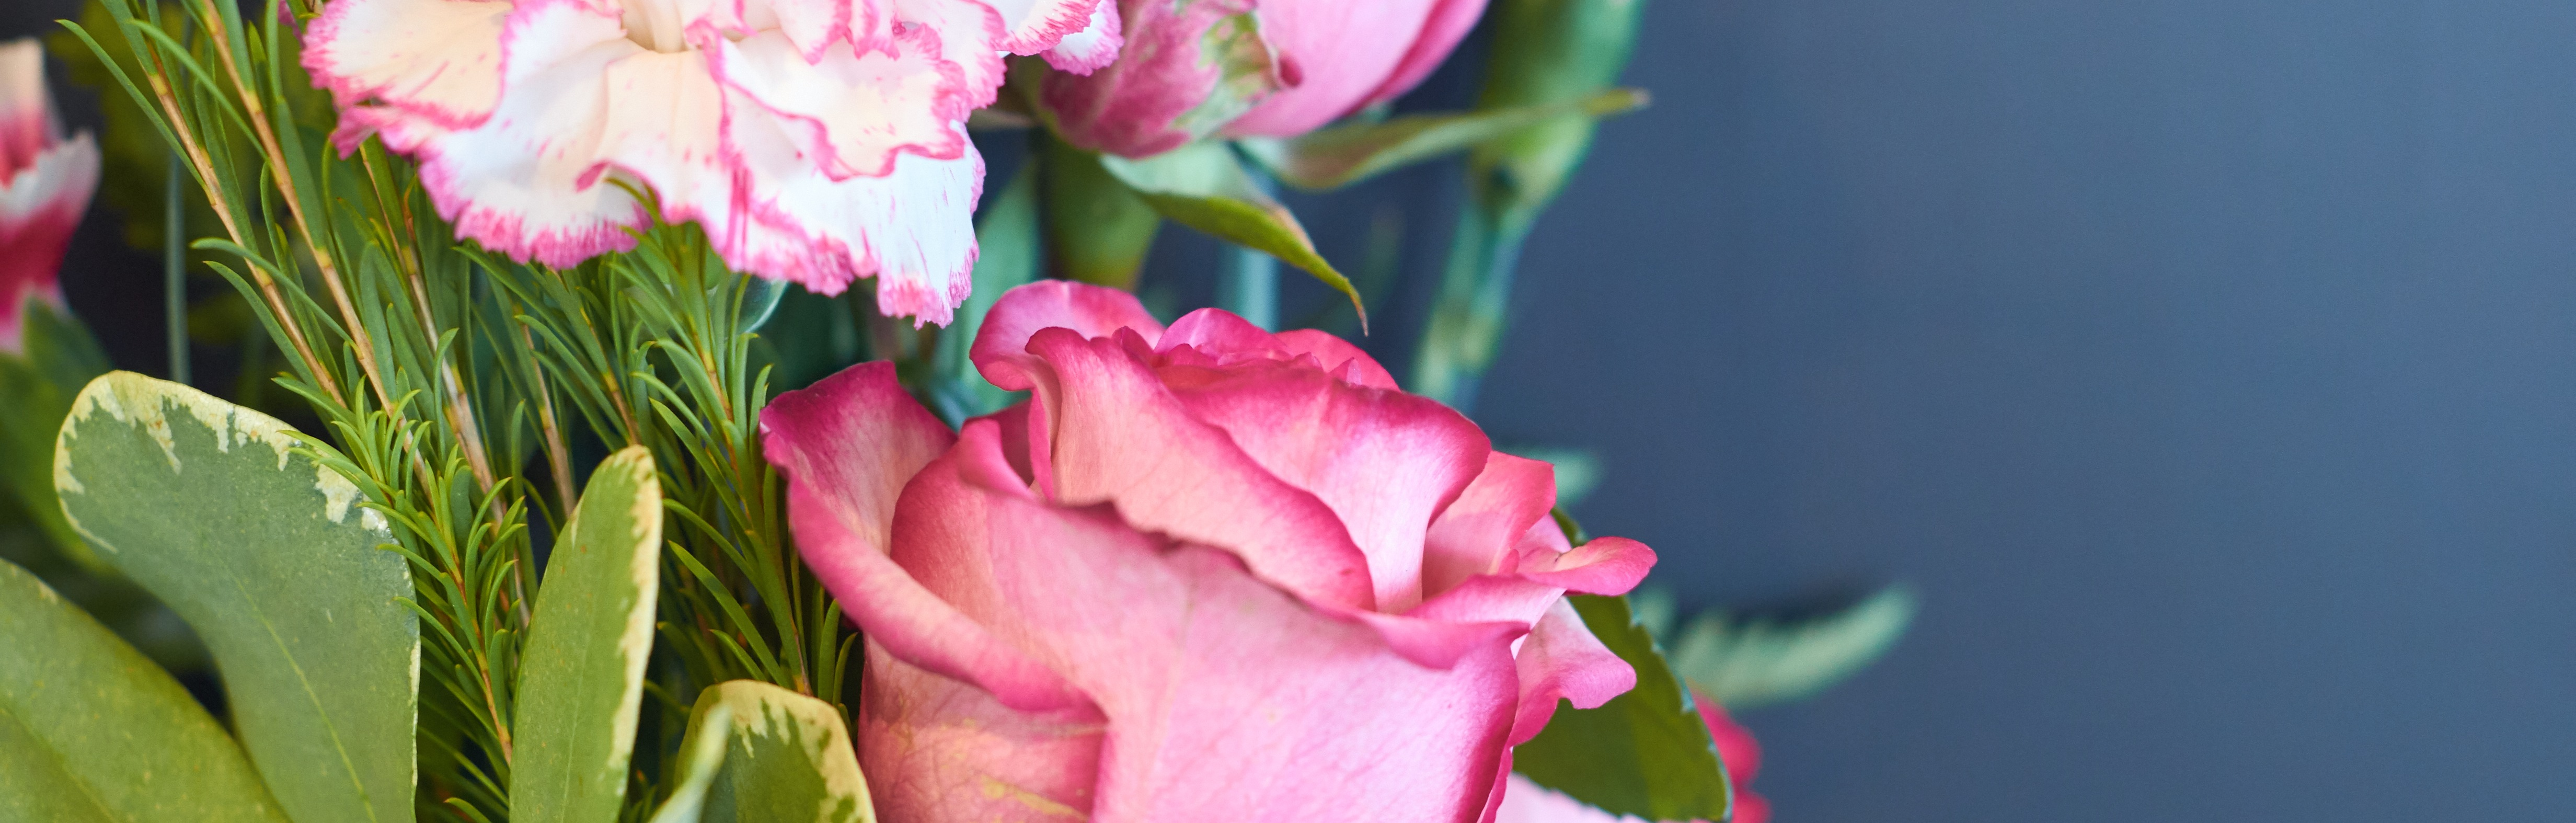 mother's day floral arrangements